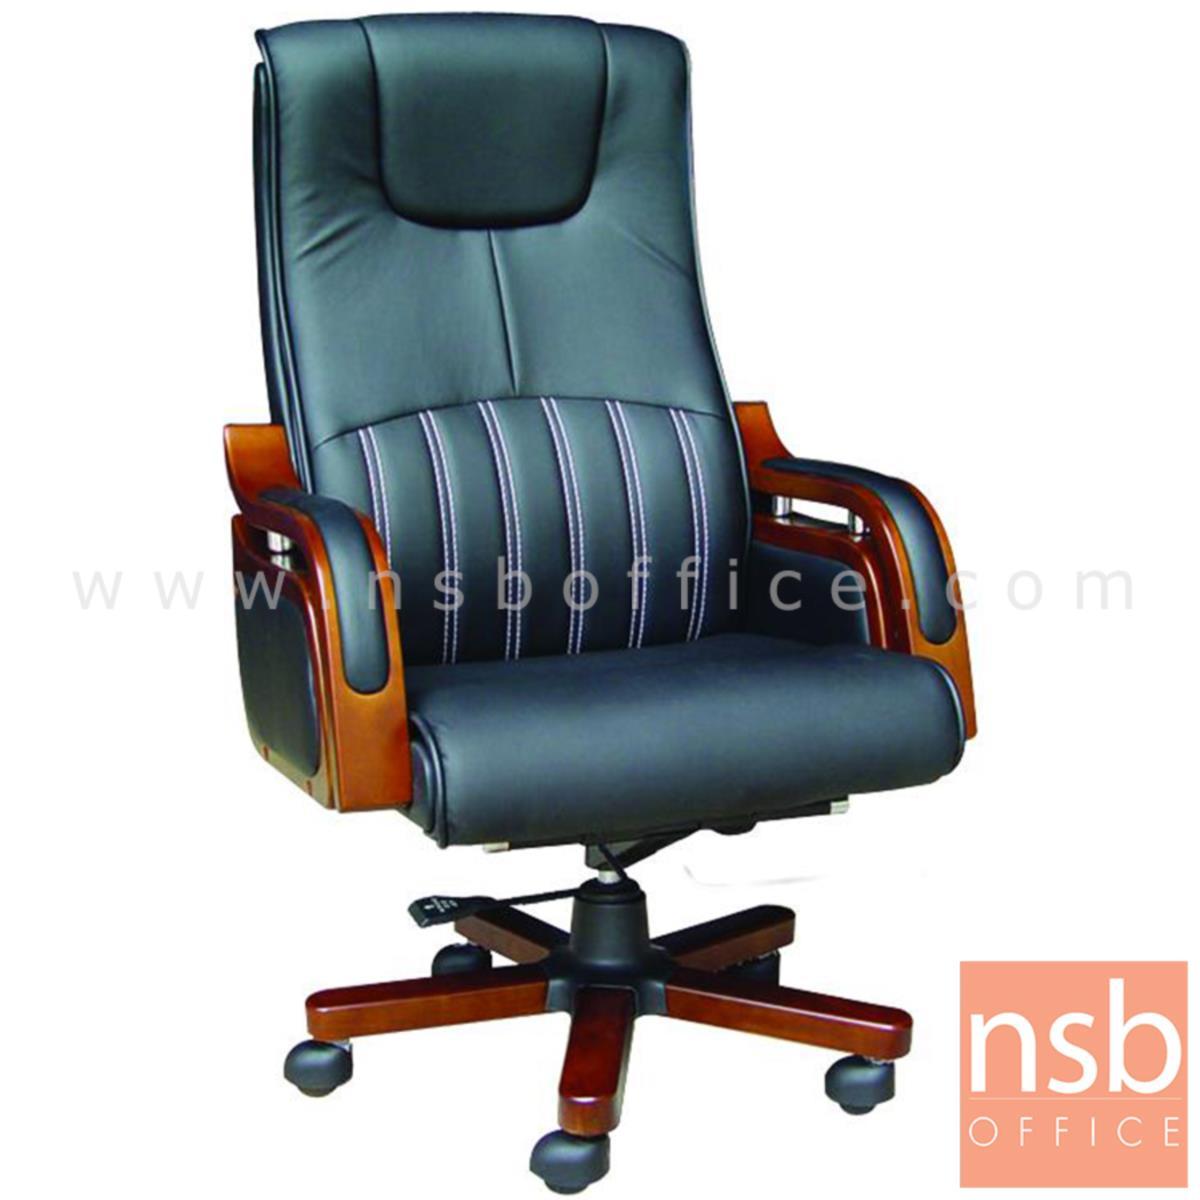 B25A024:เก้าอี้ผู้บริหารหนัง PU รุ่น Onika (โอนิกา)  โช๊คแก๊ส ขาไม้